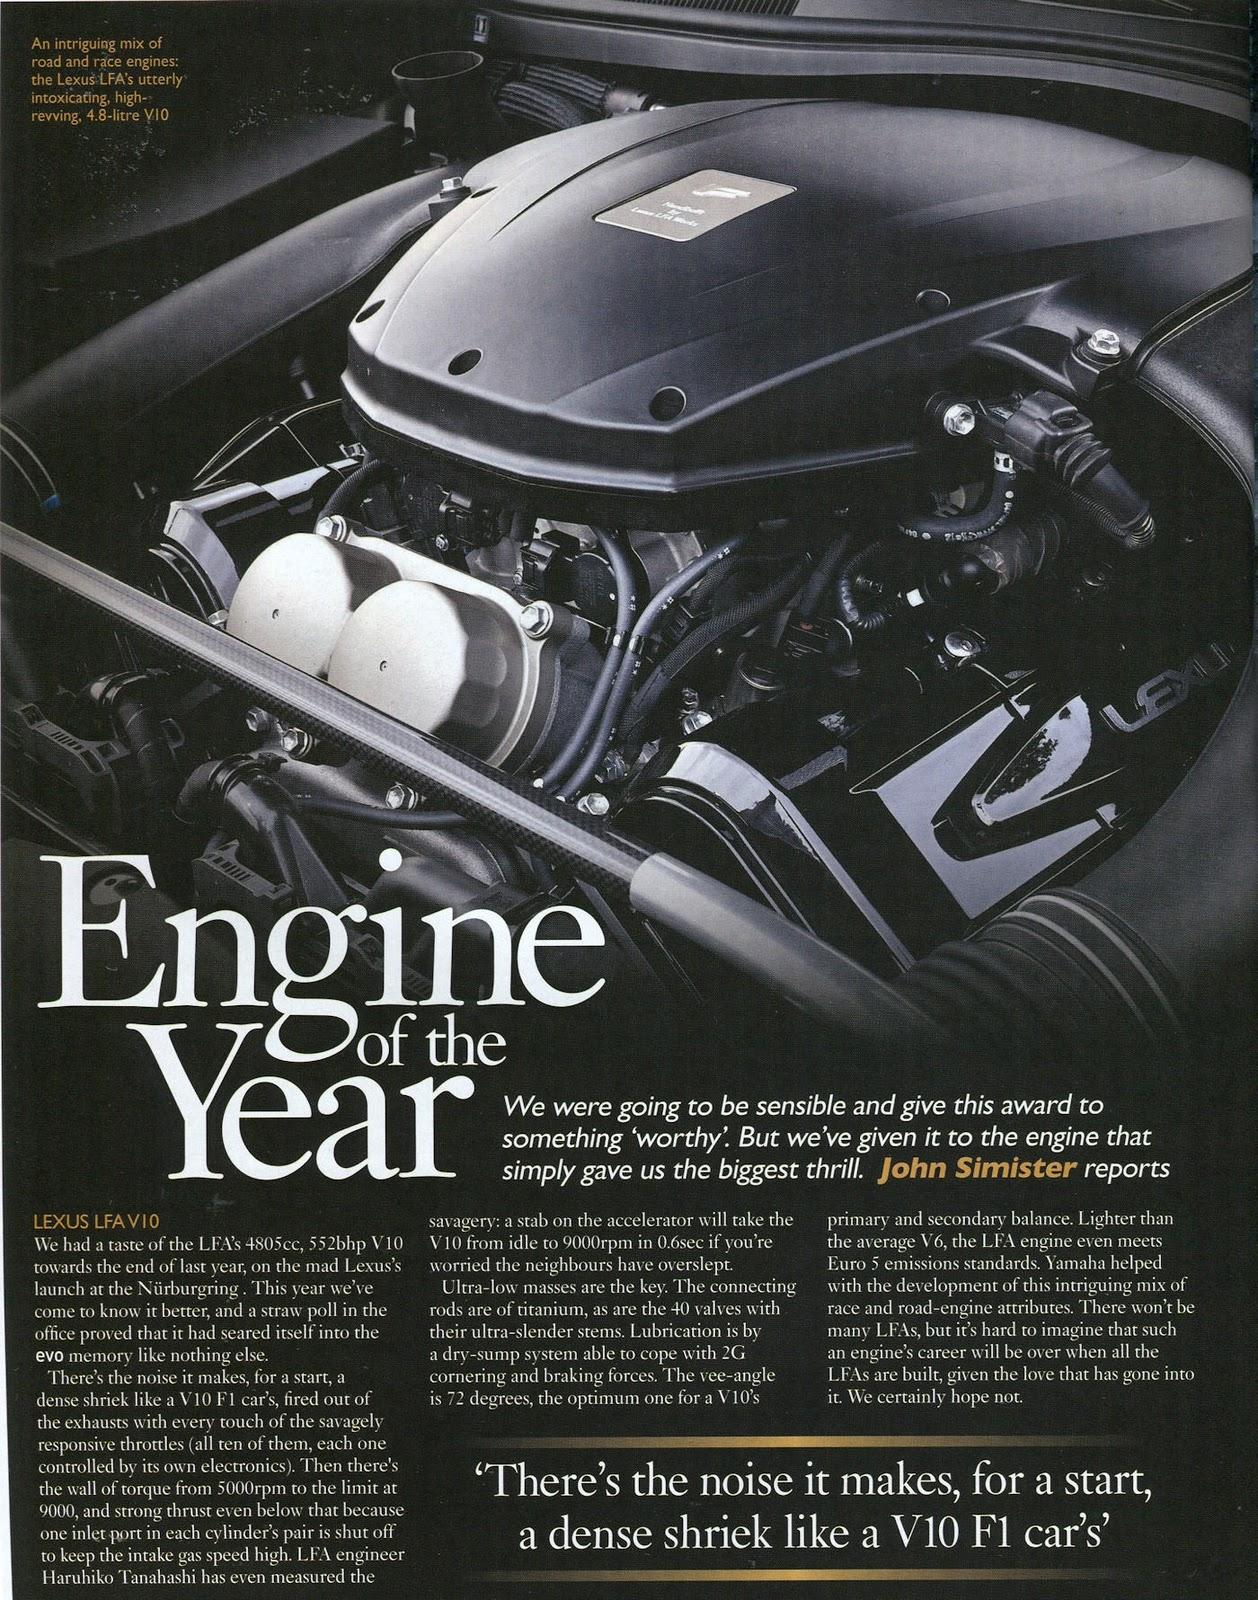 hight resolution of lfa s v10 engine wins best engine of the year award by evo uk